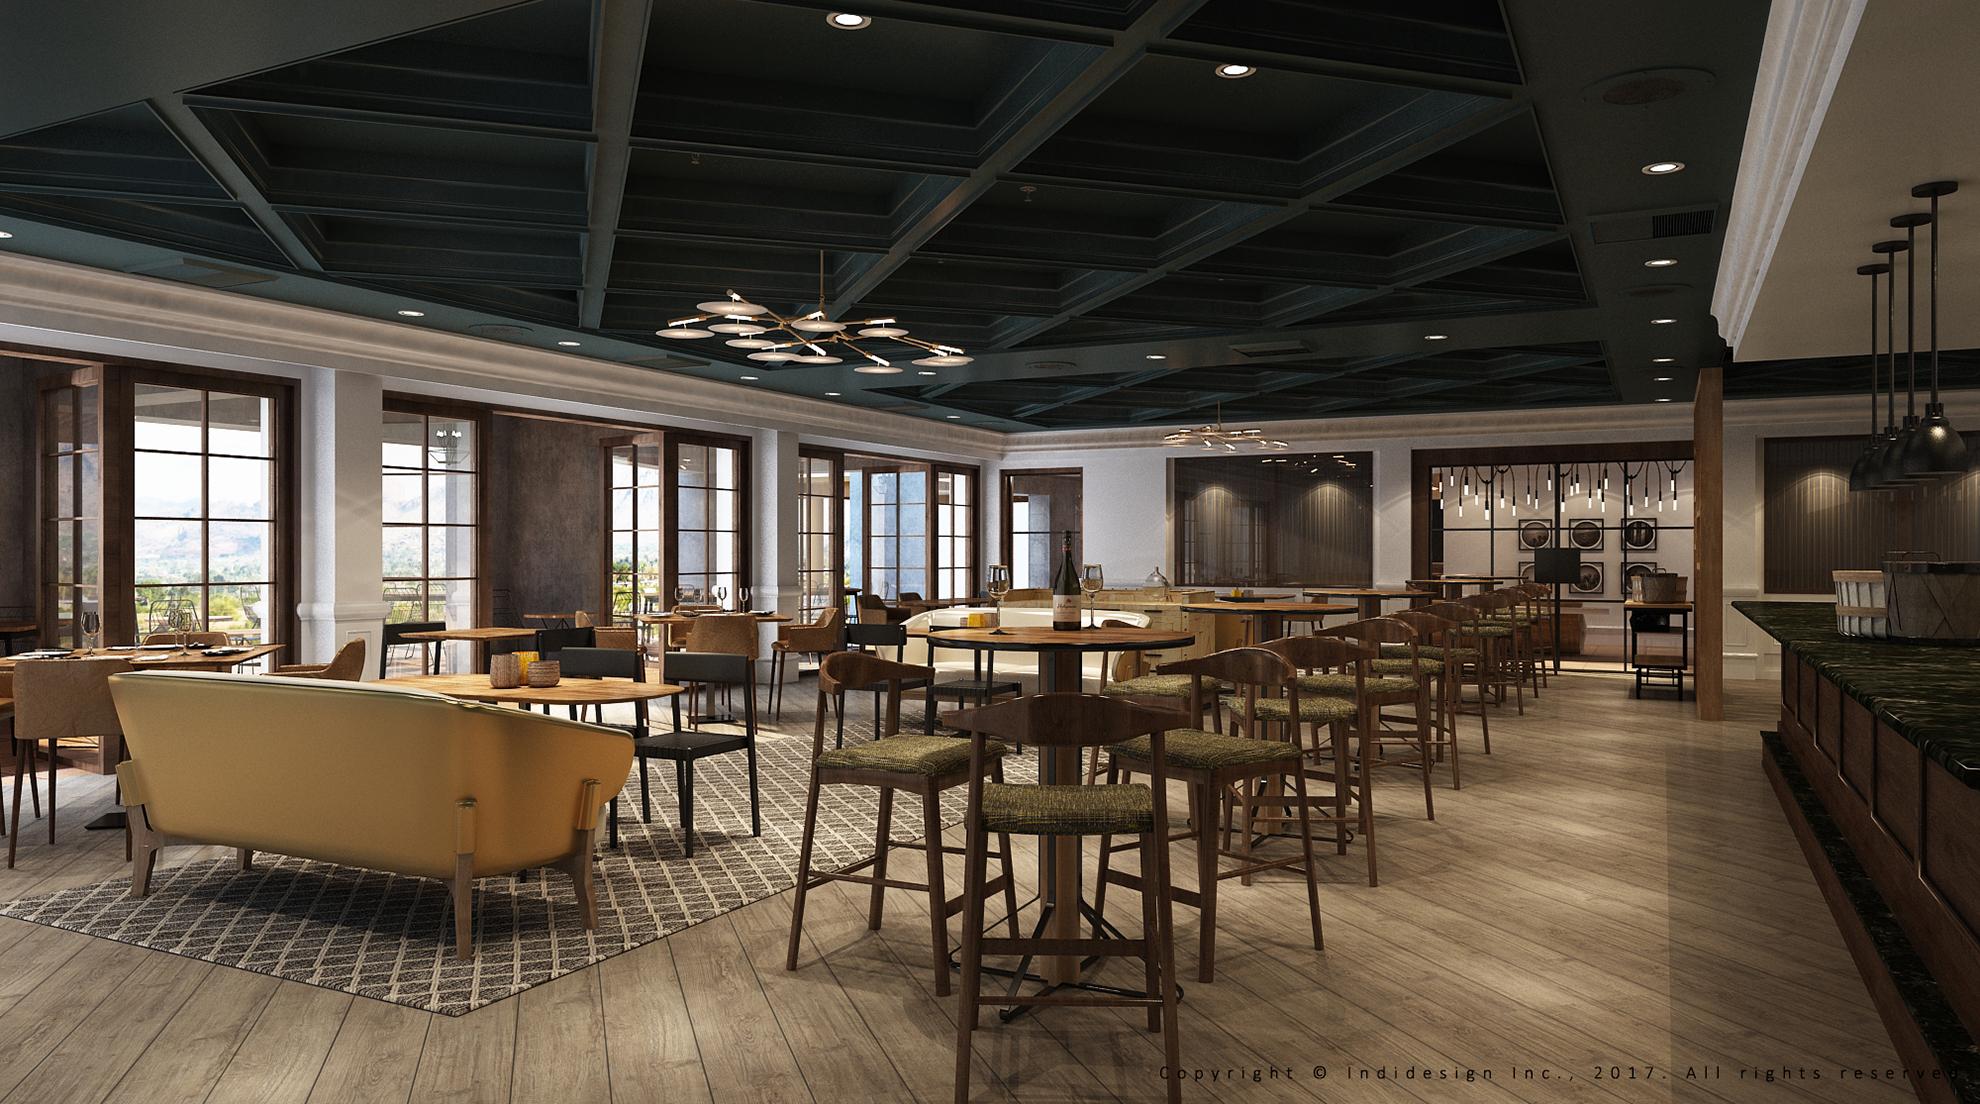 Miramonte Indian Wells Resort & Spa debuts $8M upgrade